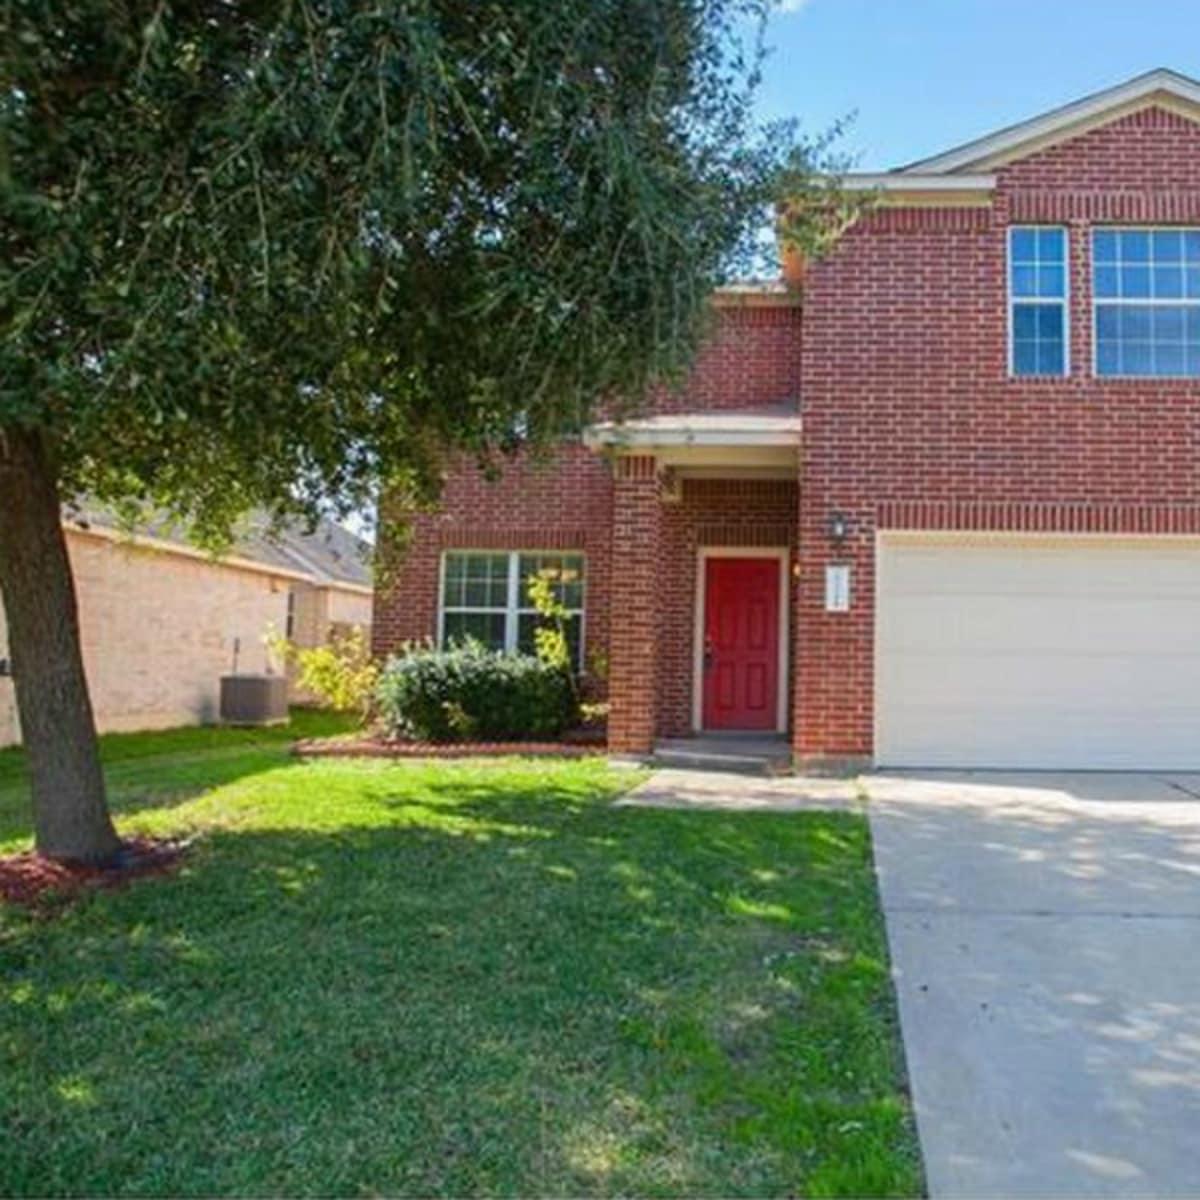 Austin house home Pflugerville 20324 Farm Pond Ln 78660 February 2016 front